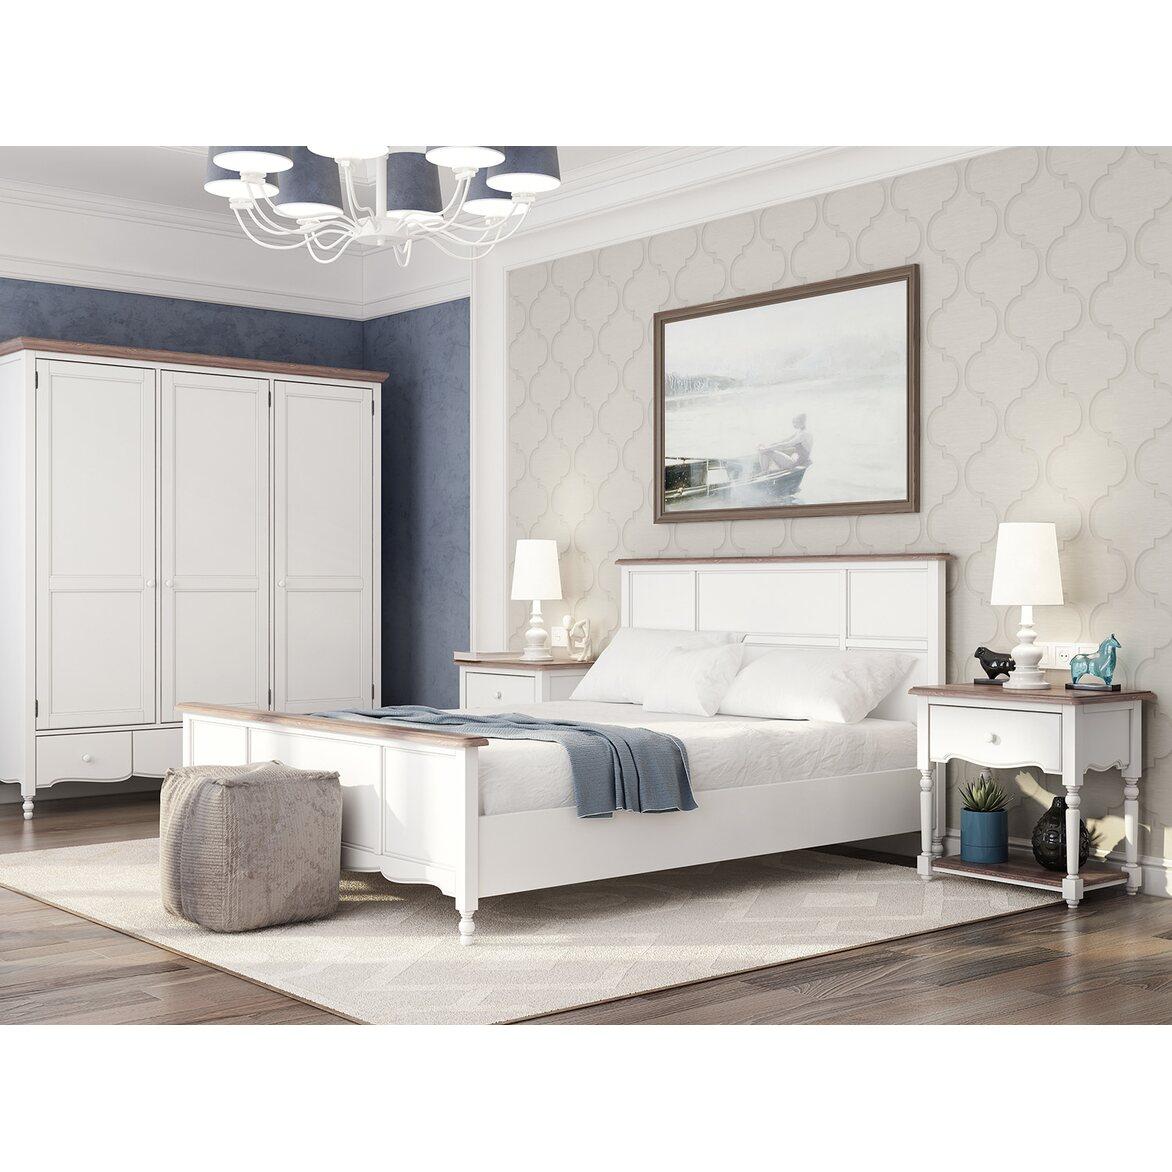 Кровать двуспальная 160*200 Leblanc, белая 4   Двуспальные кровати Kingsby